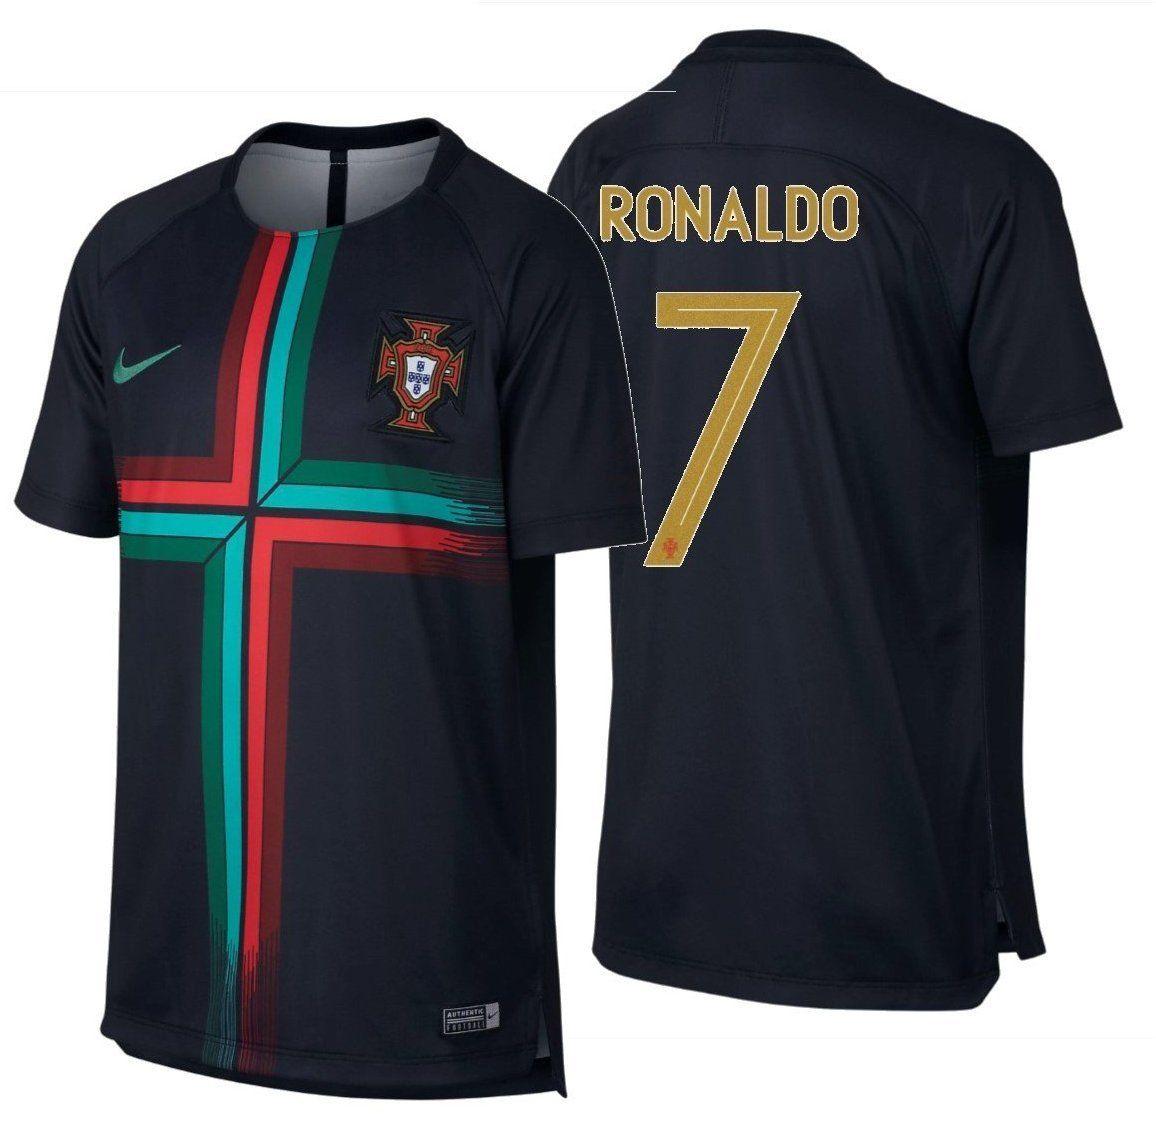 Nike Cristiano Ronaldo Portugal Youth Squad Training Jersey Fifa World Cup 2018 Cristiano Ronaldo Portugal Cristiano Ronaldo Ronaldo